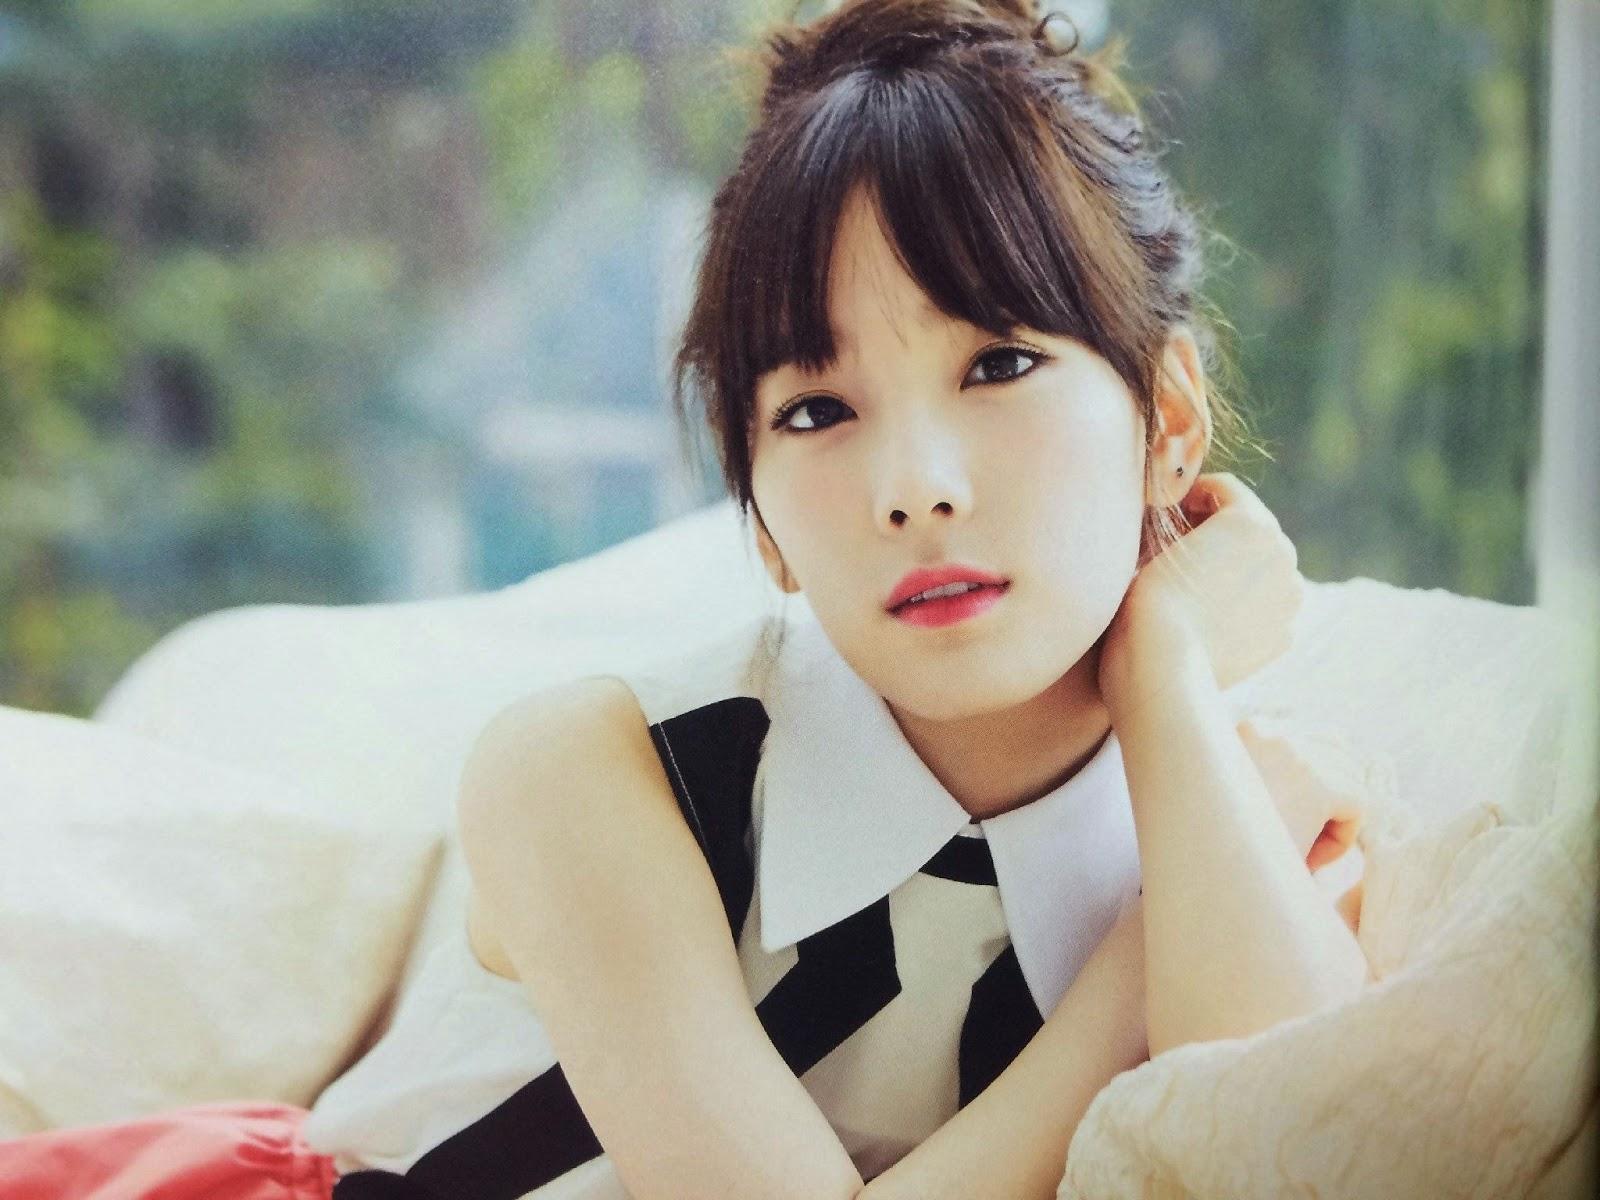 SNSD Taeyeon (태연; テヨン) Girls Generation The Best Scan Photos 7